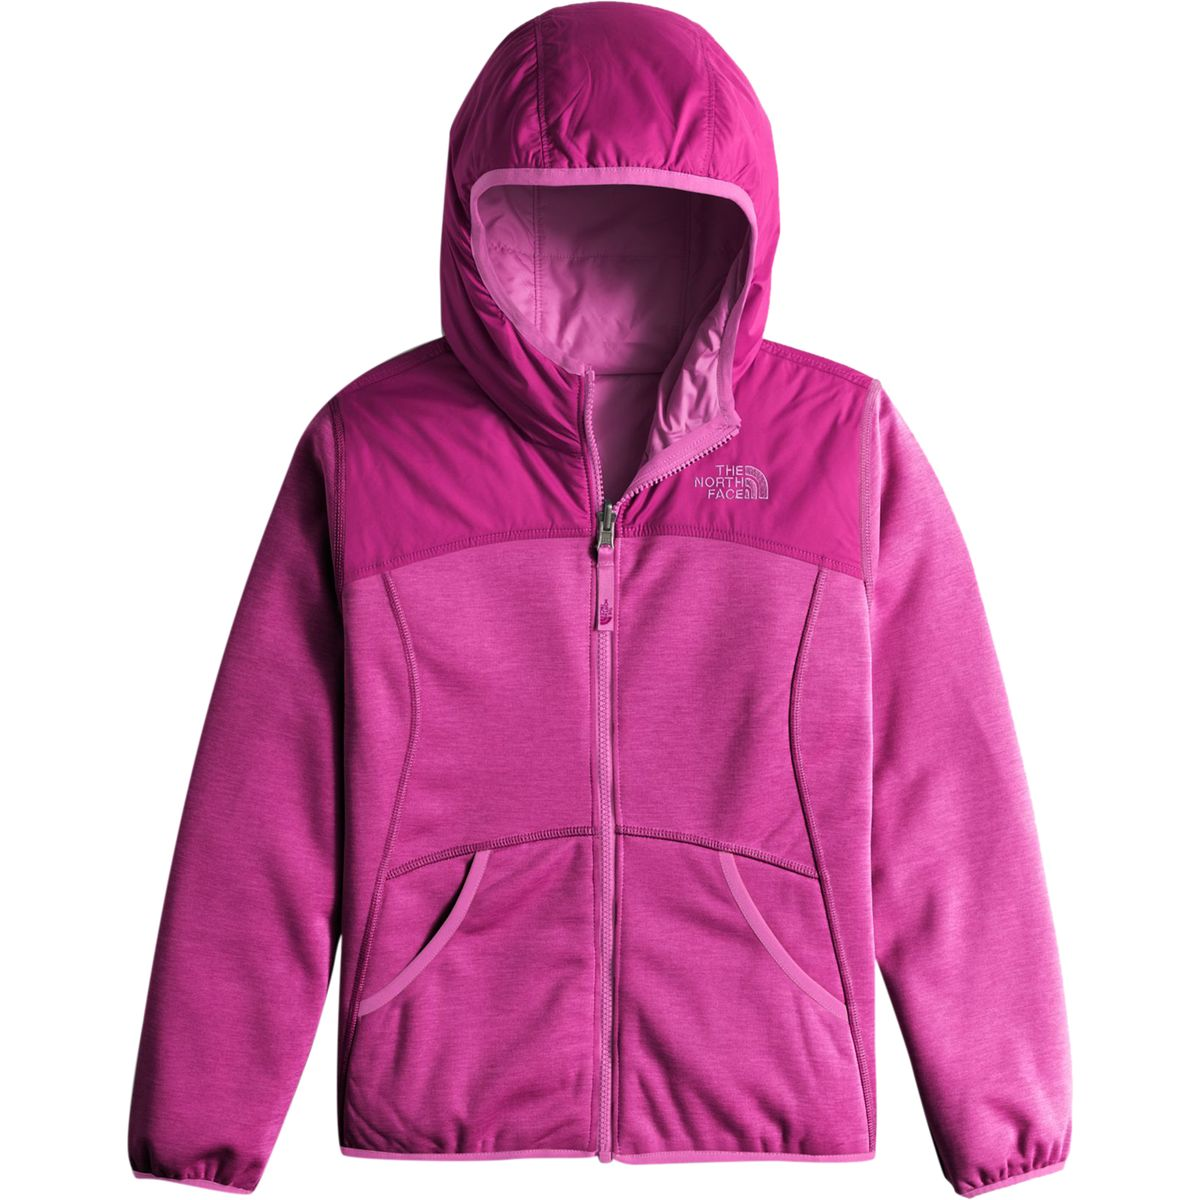 The North Face Haldee Reversible Fleece Hooded Jacket - Girls